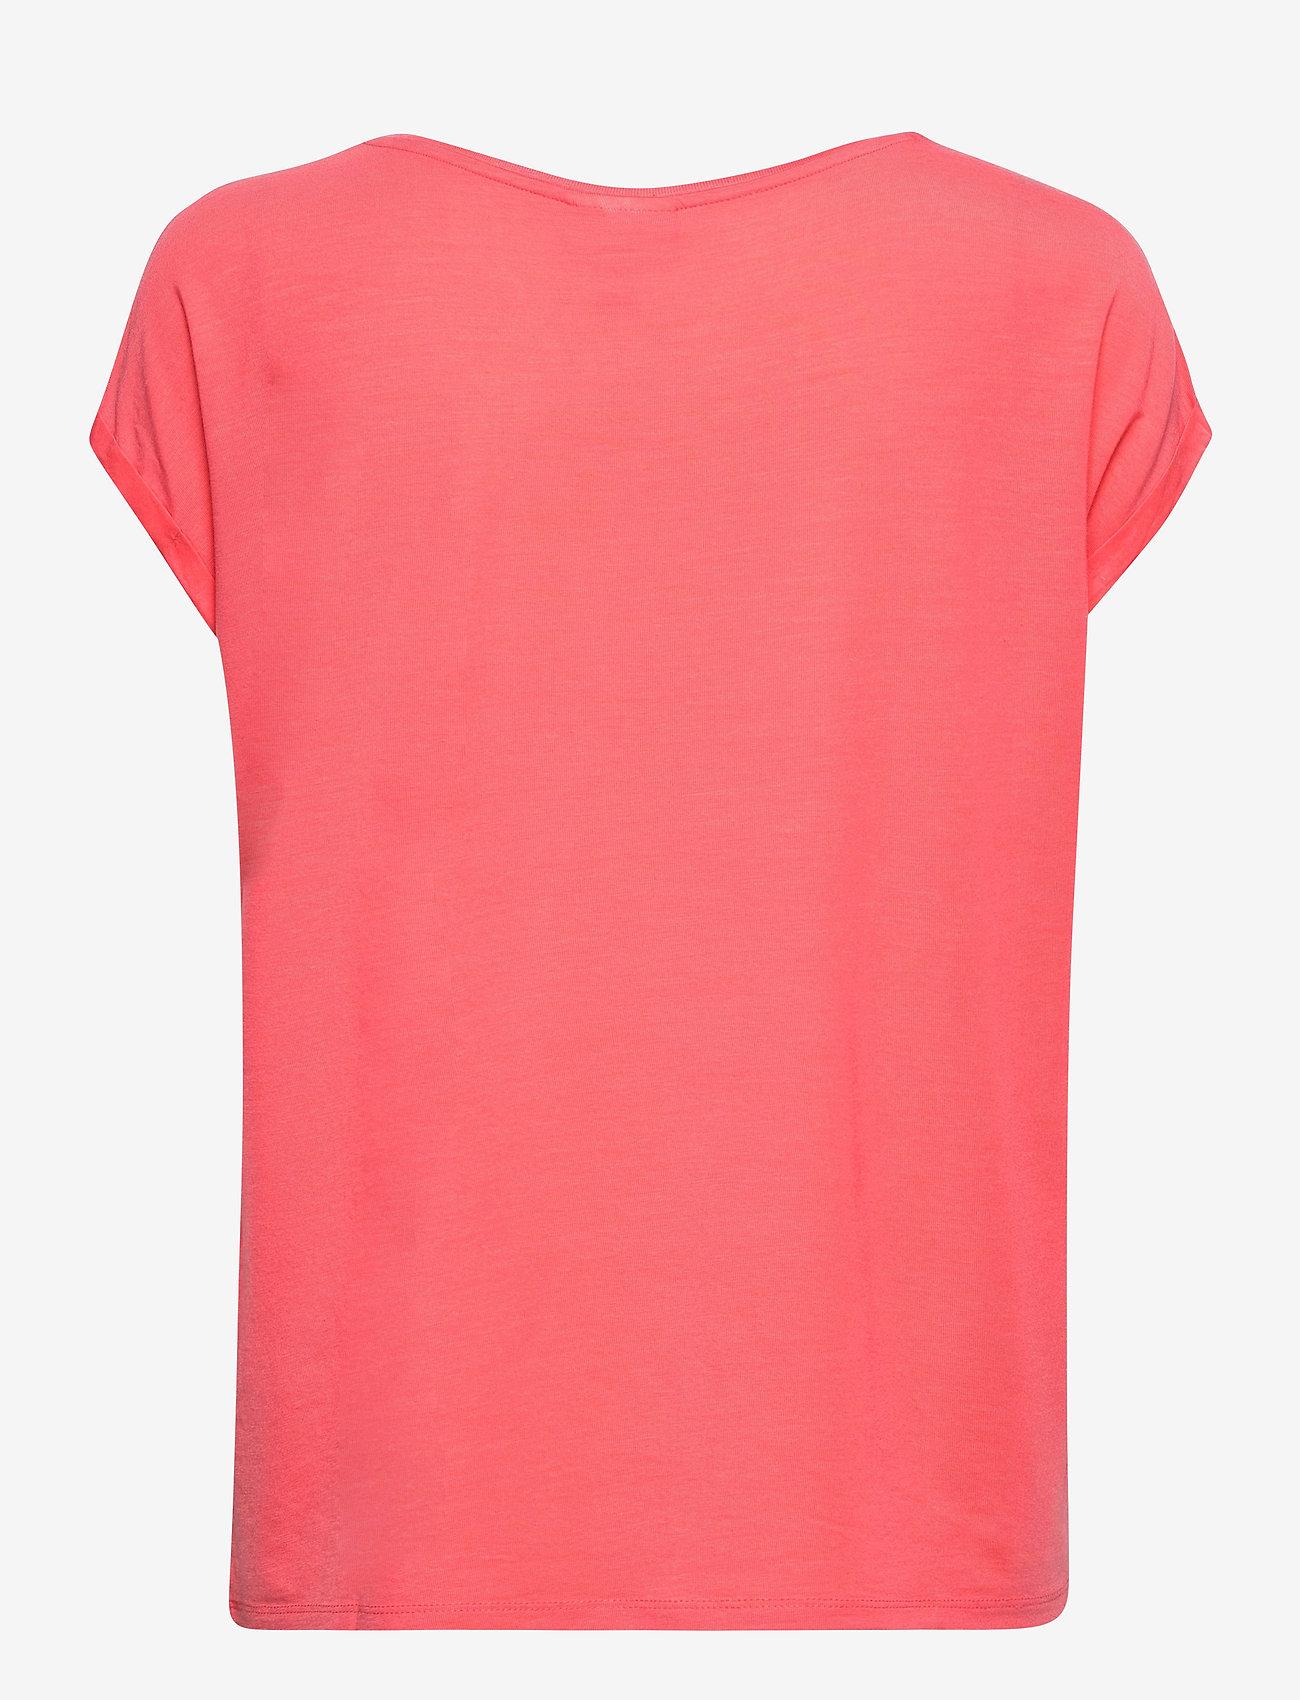 Vero Moda - VMAVA PLAIN SS TOP GA - t-shirts - dubarry - 1